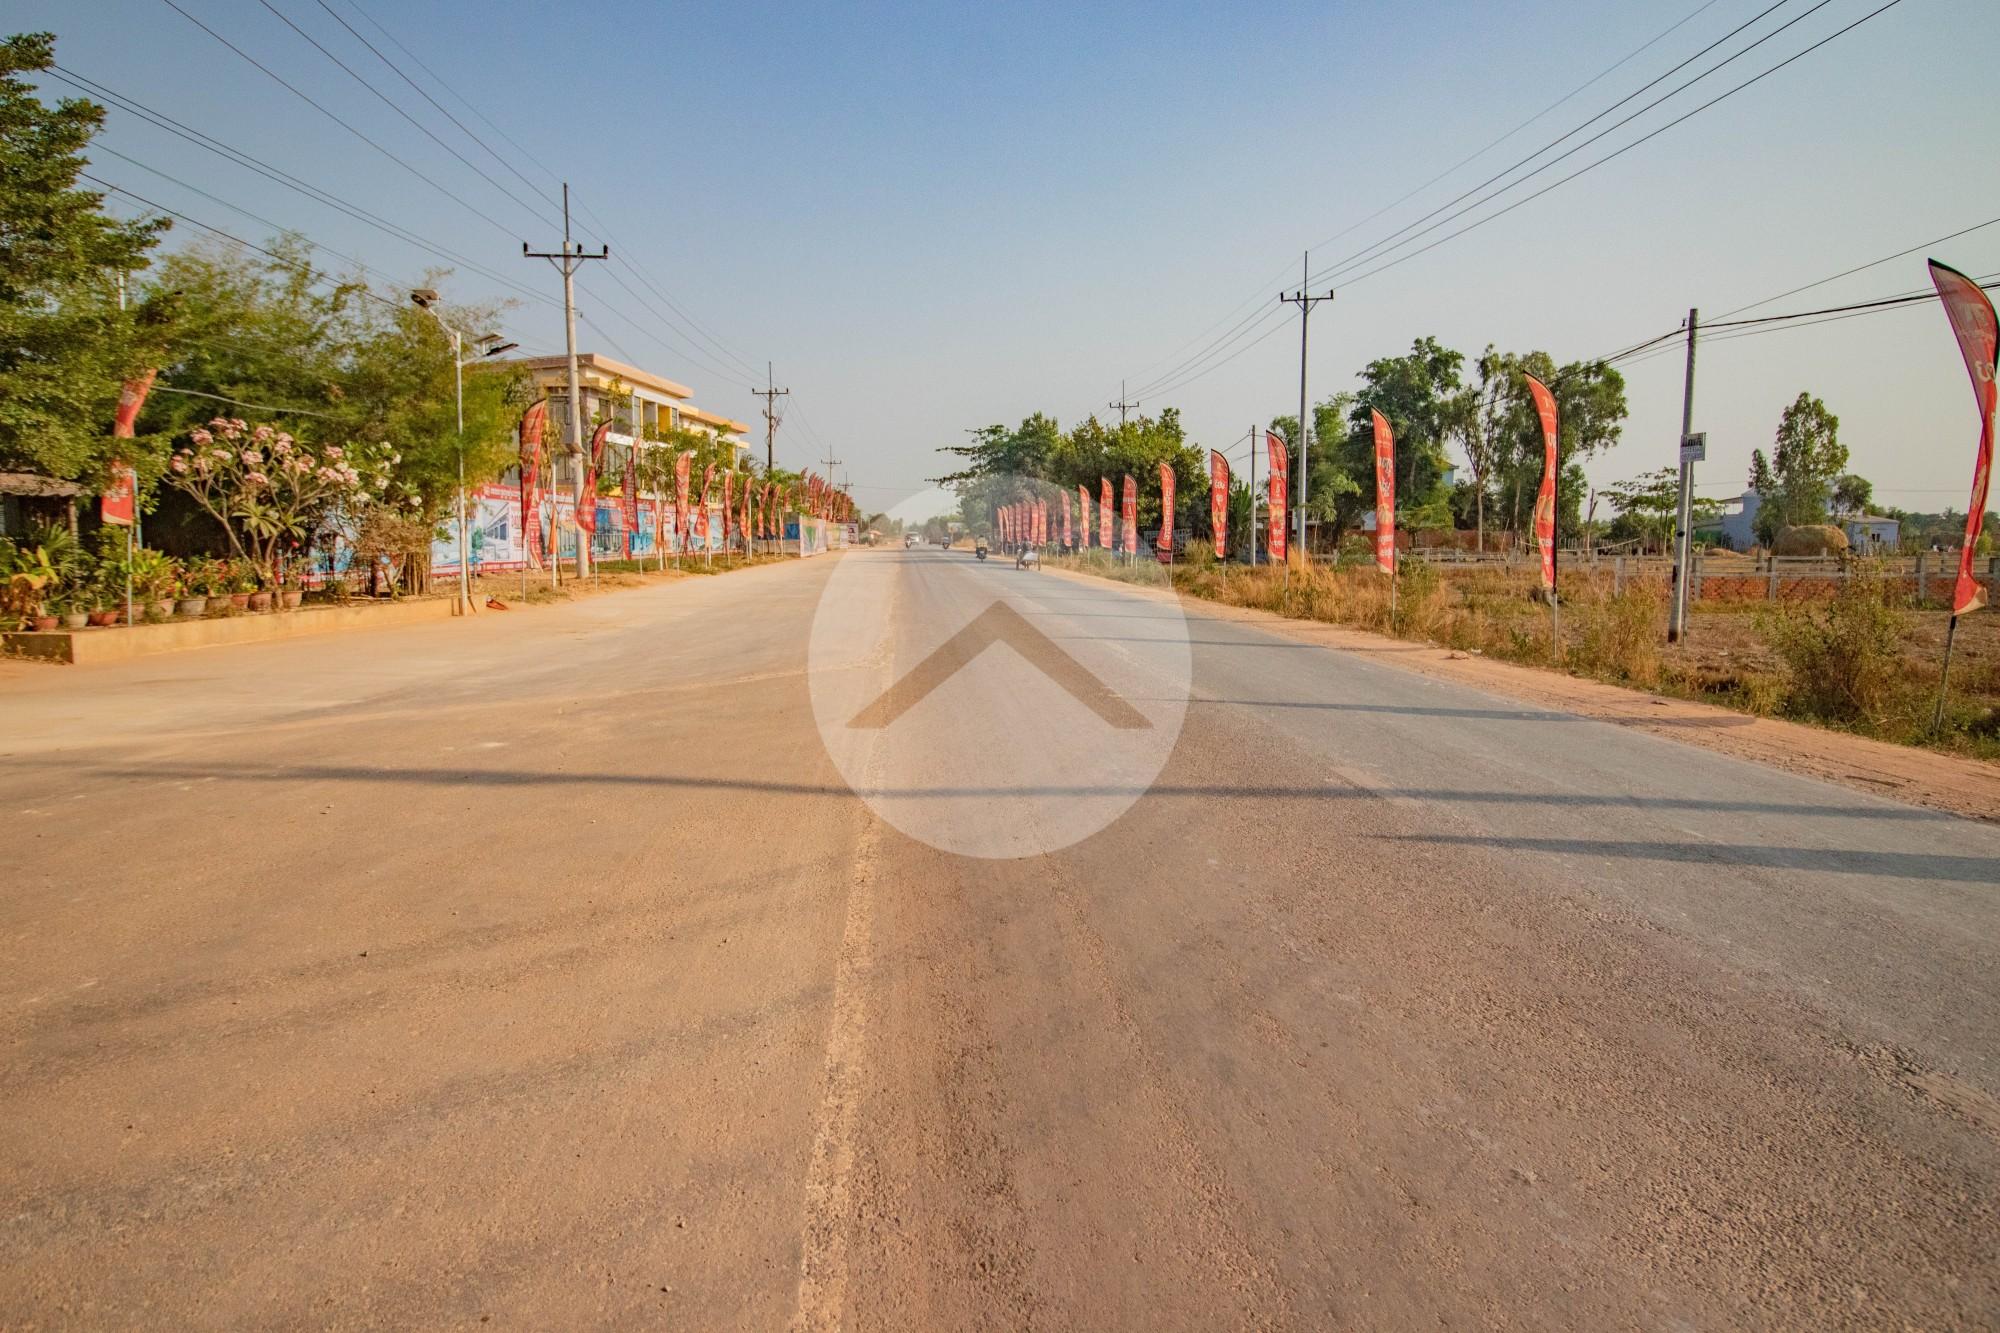 100 Sqm Residential Land For Sale - Svay Thom, Siem Reap